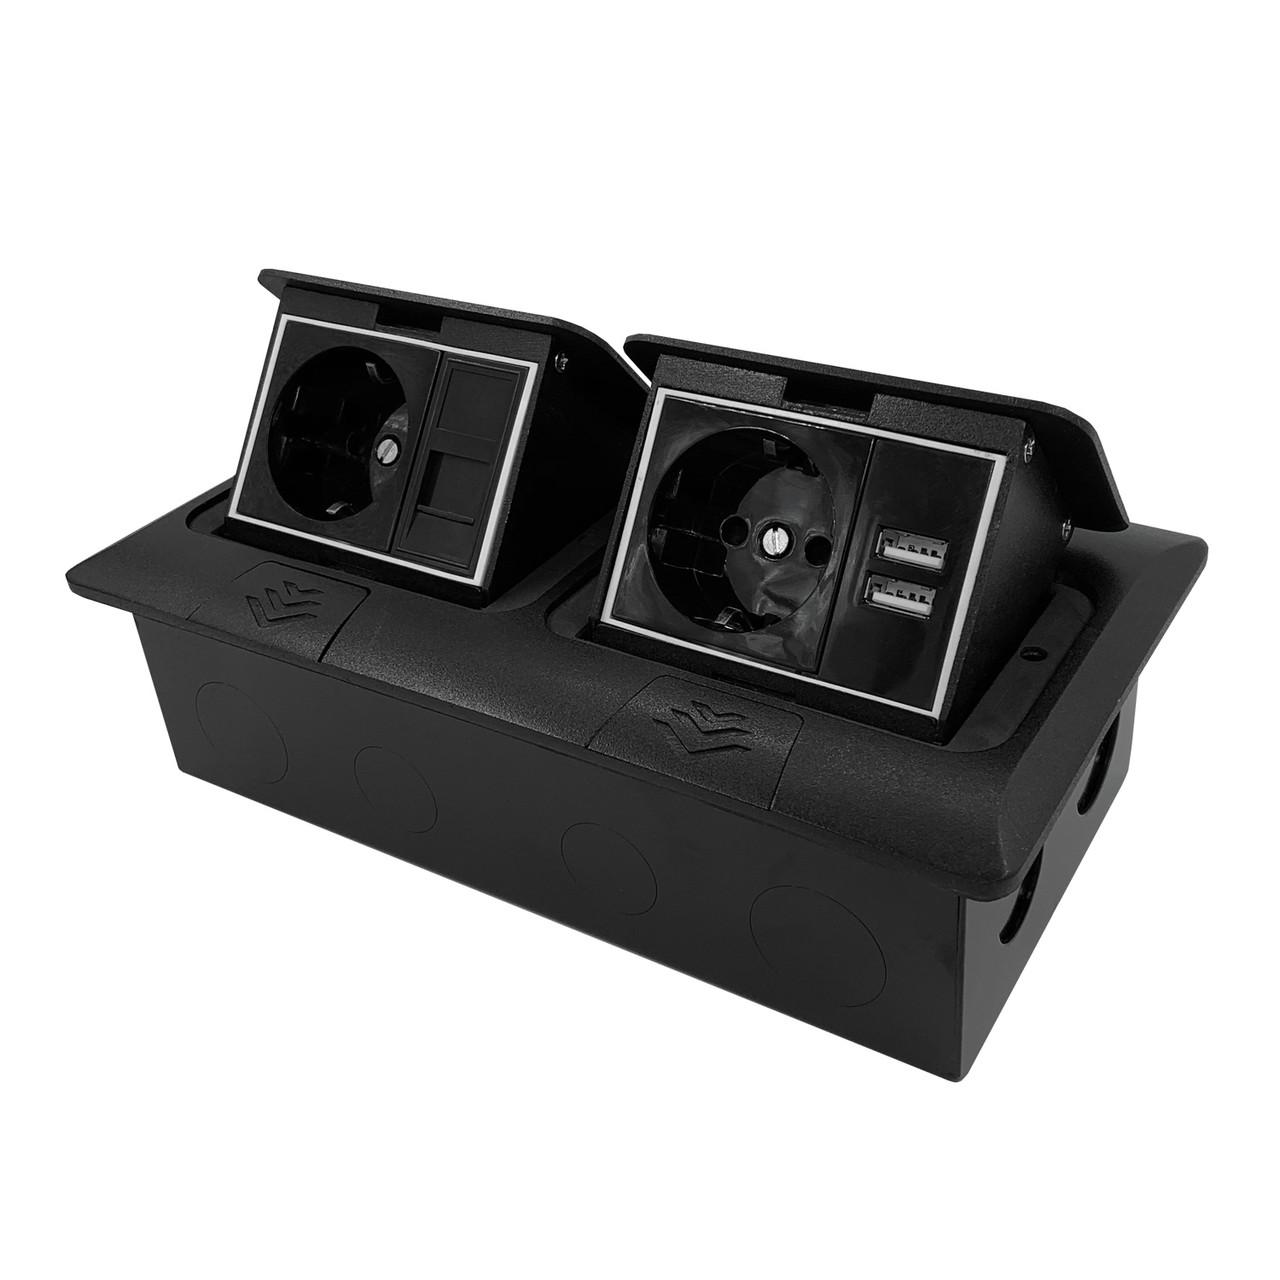 Shelbi Напольный/настольный лючок на 2х3 модуля, металл, чёрный